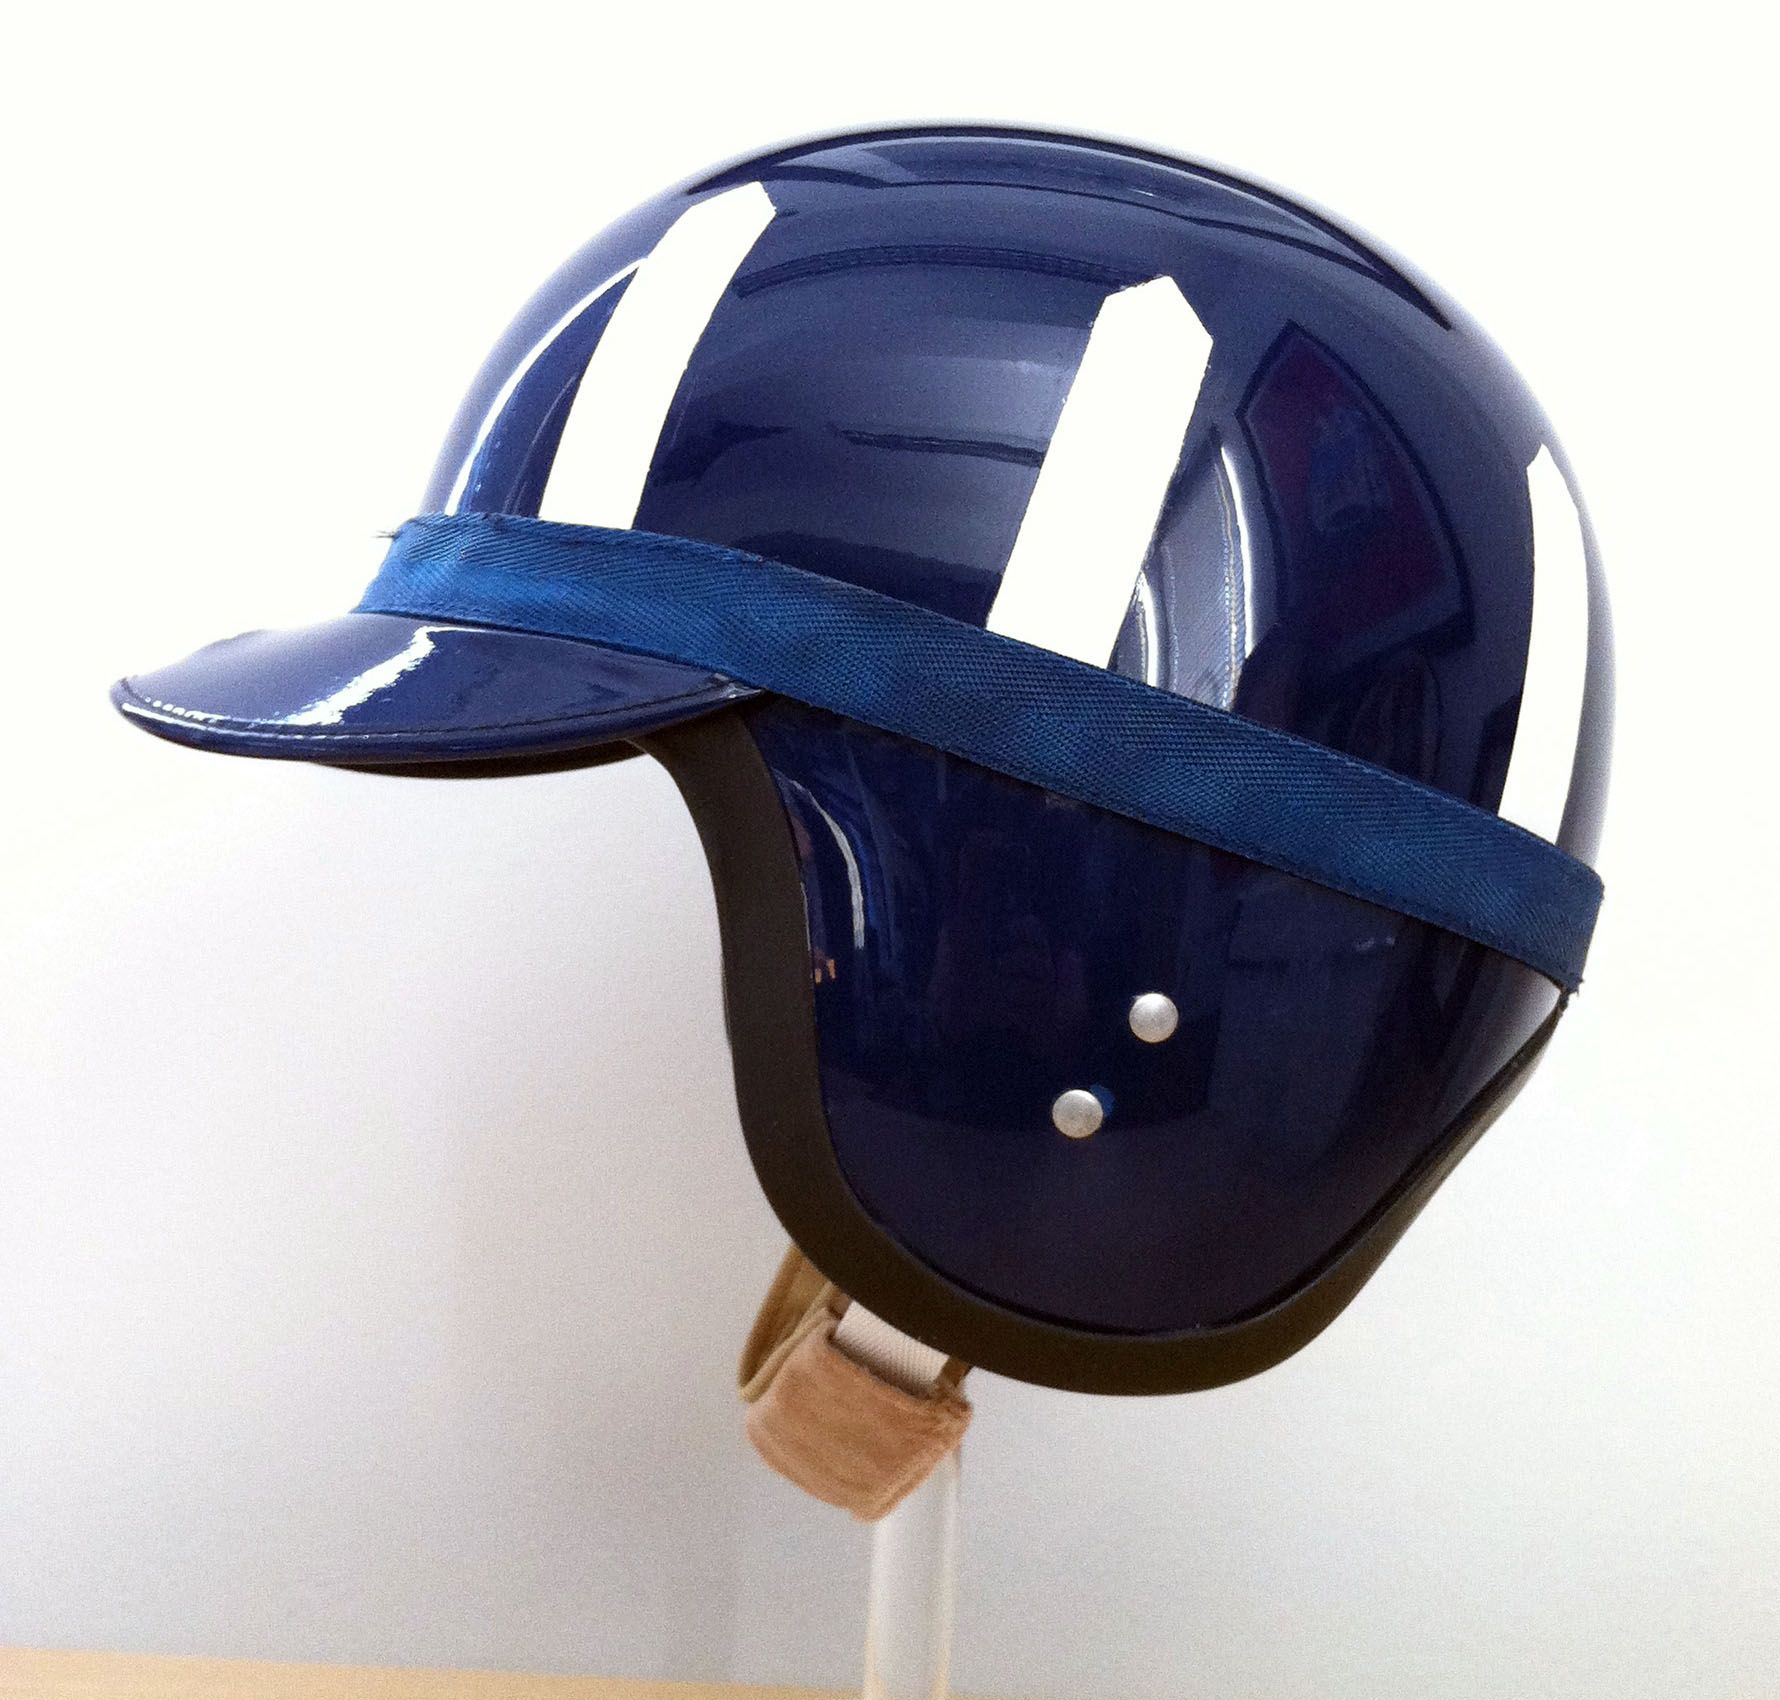 graham hill helmet Google Search Helmet, Helmet design